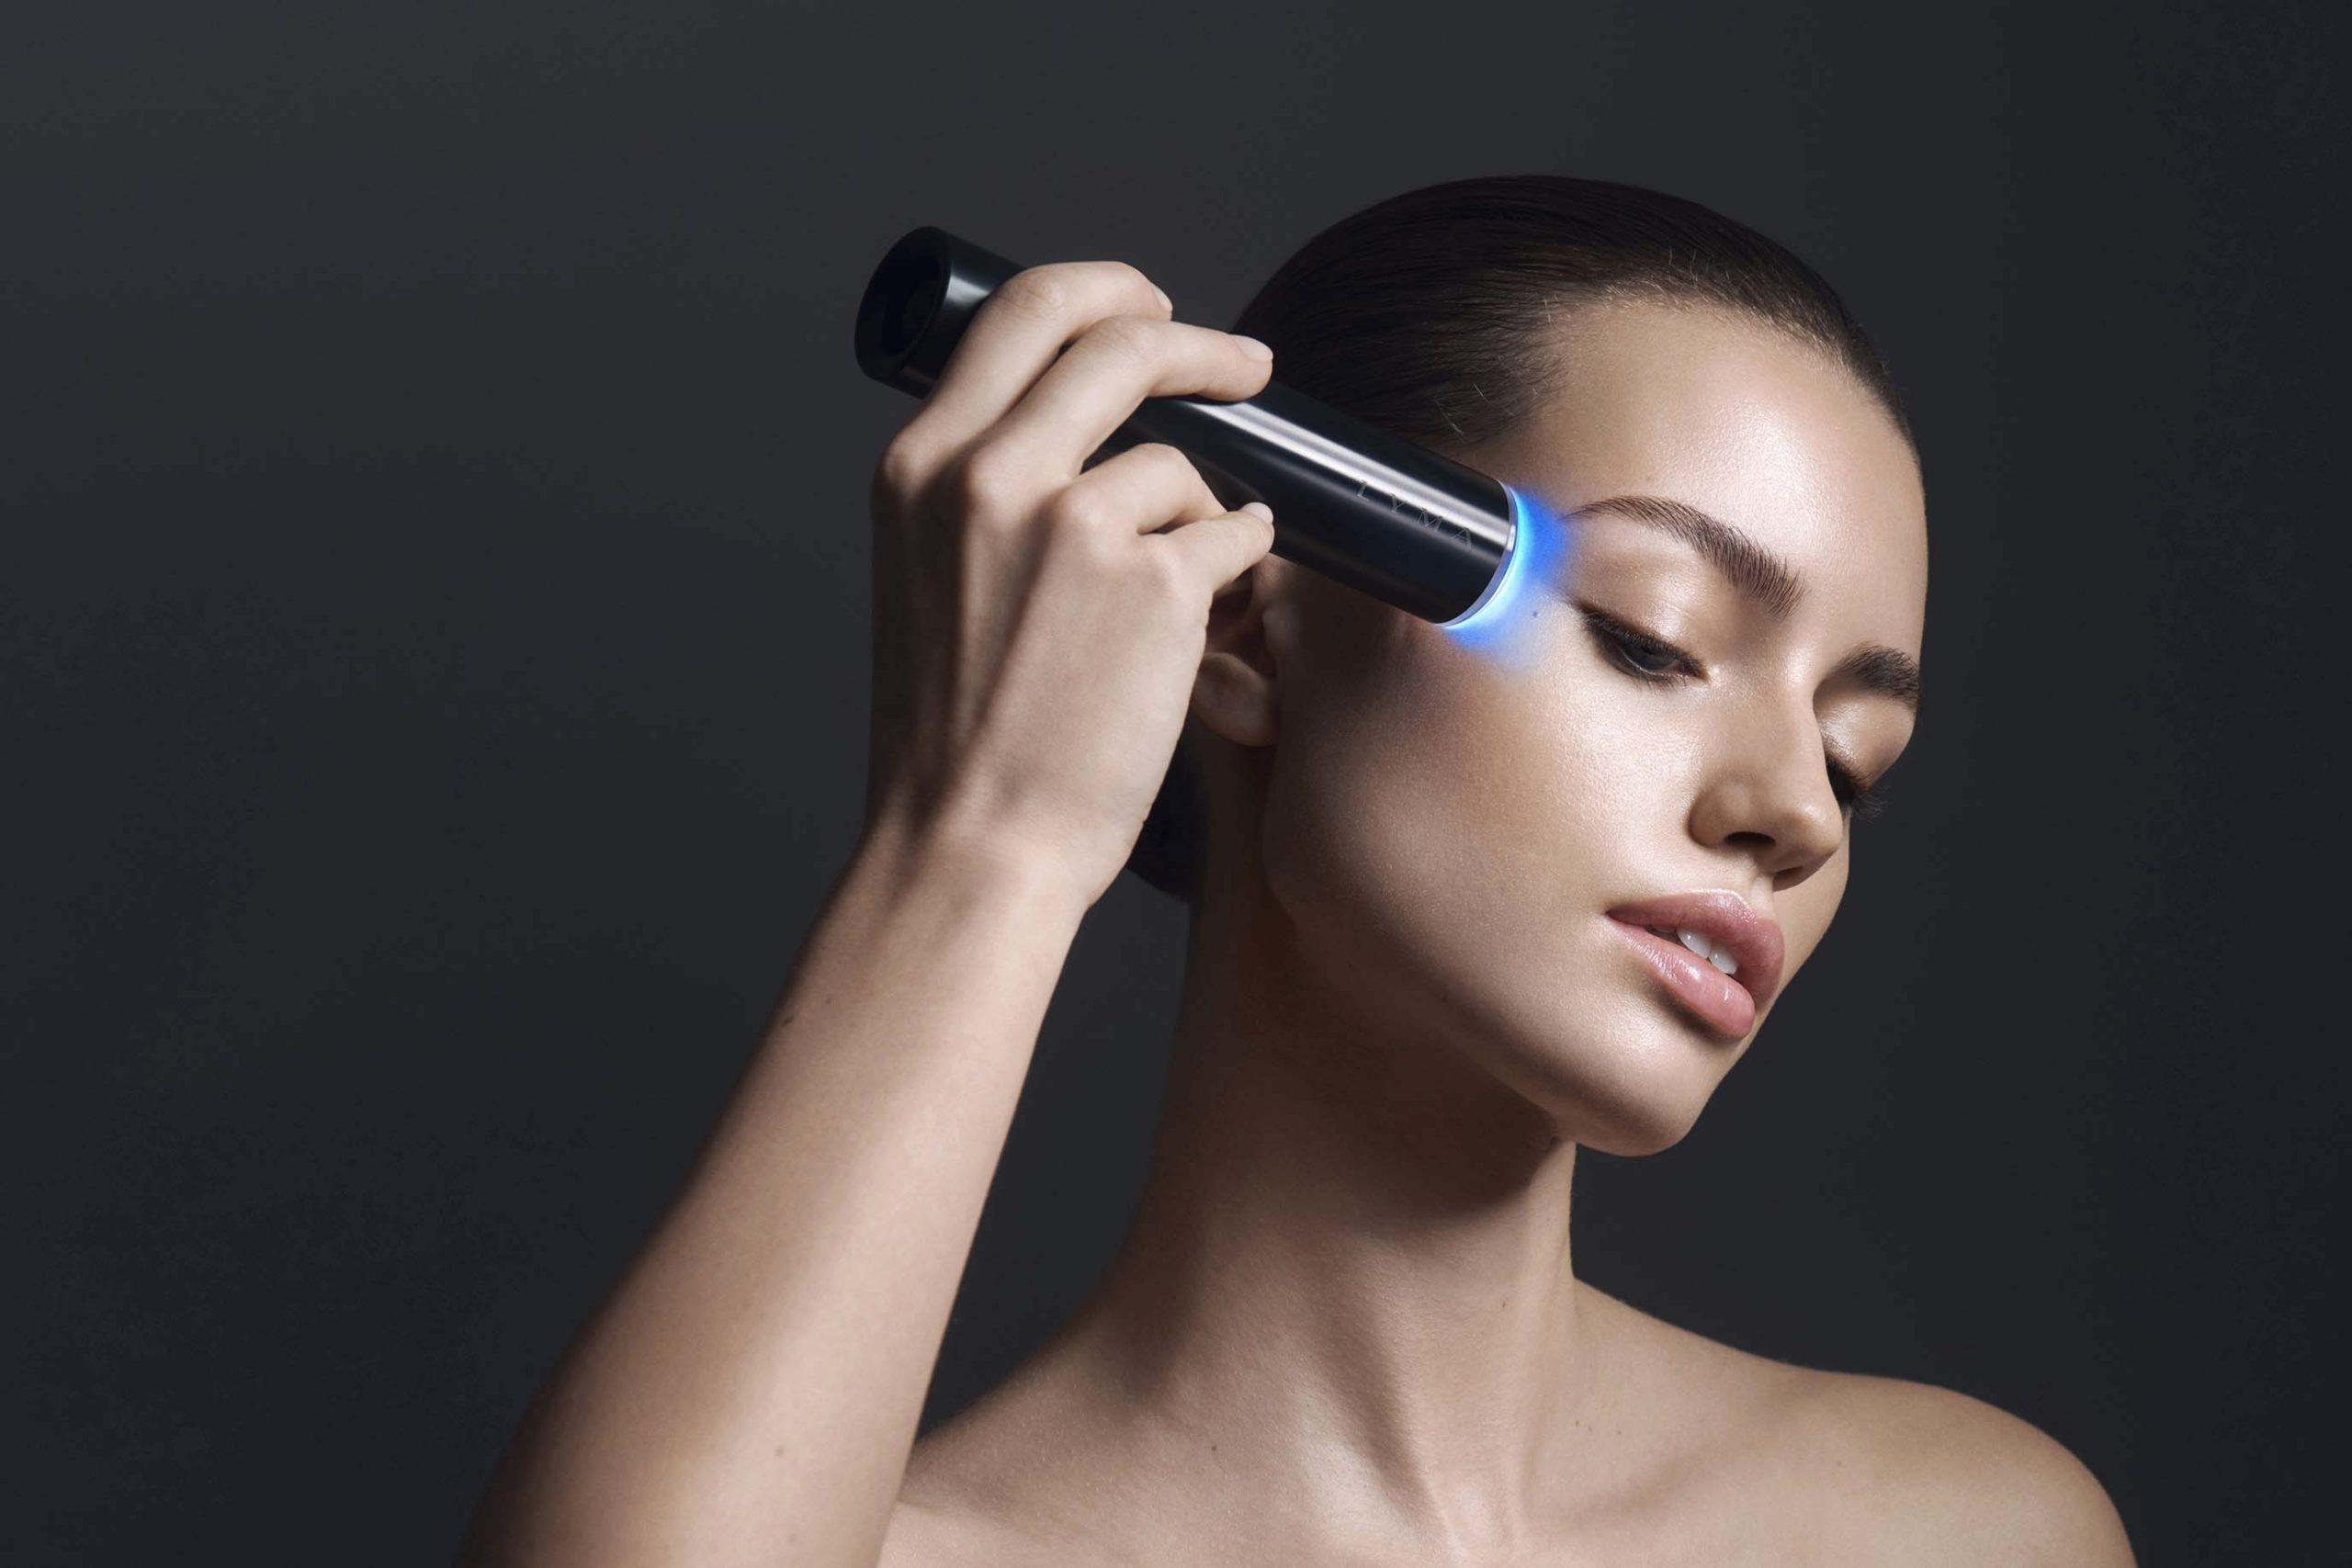 JOYCE Beauty Gadget Bar Beauty Devices at Lane Crawford ifc